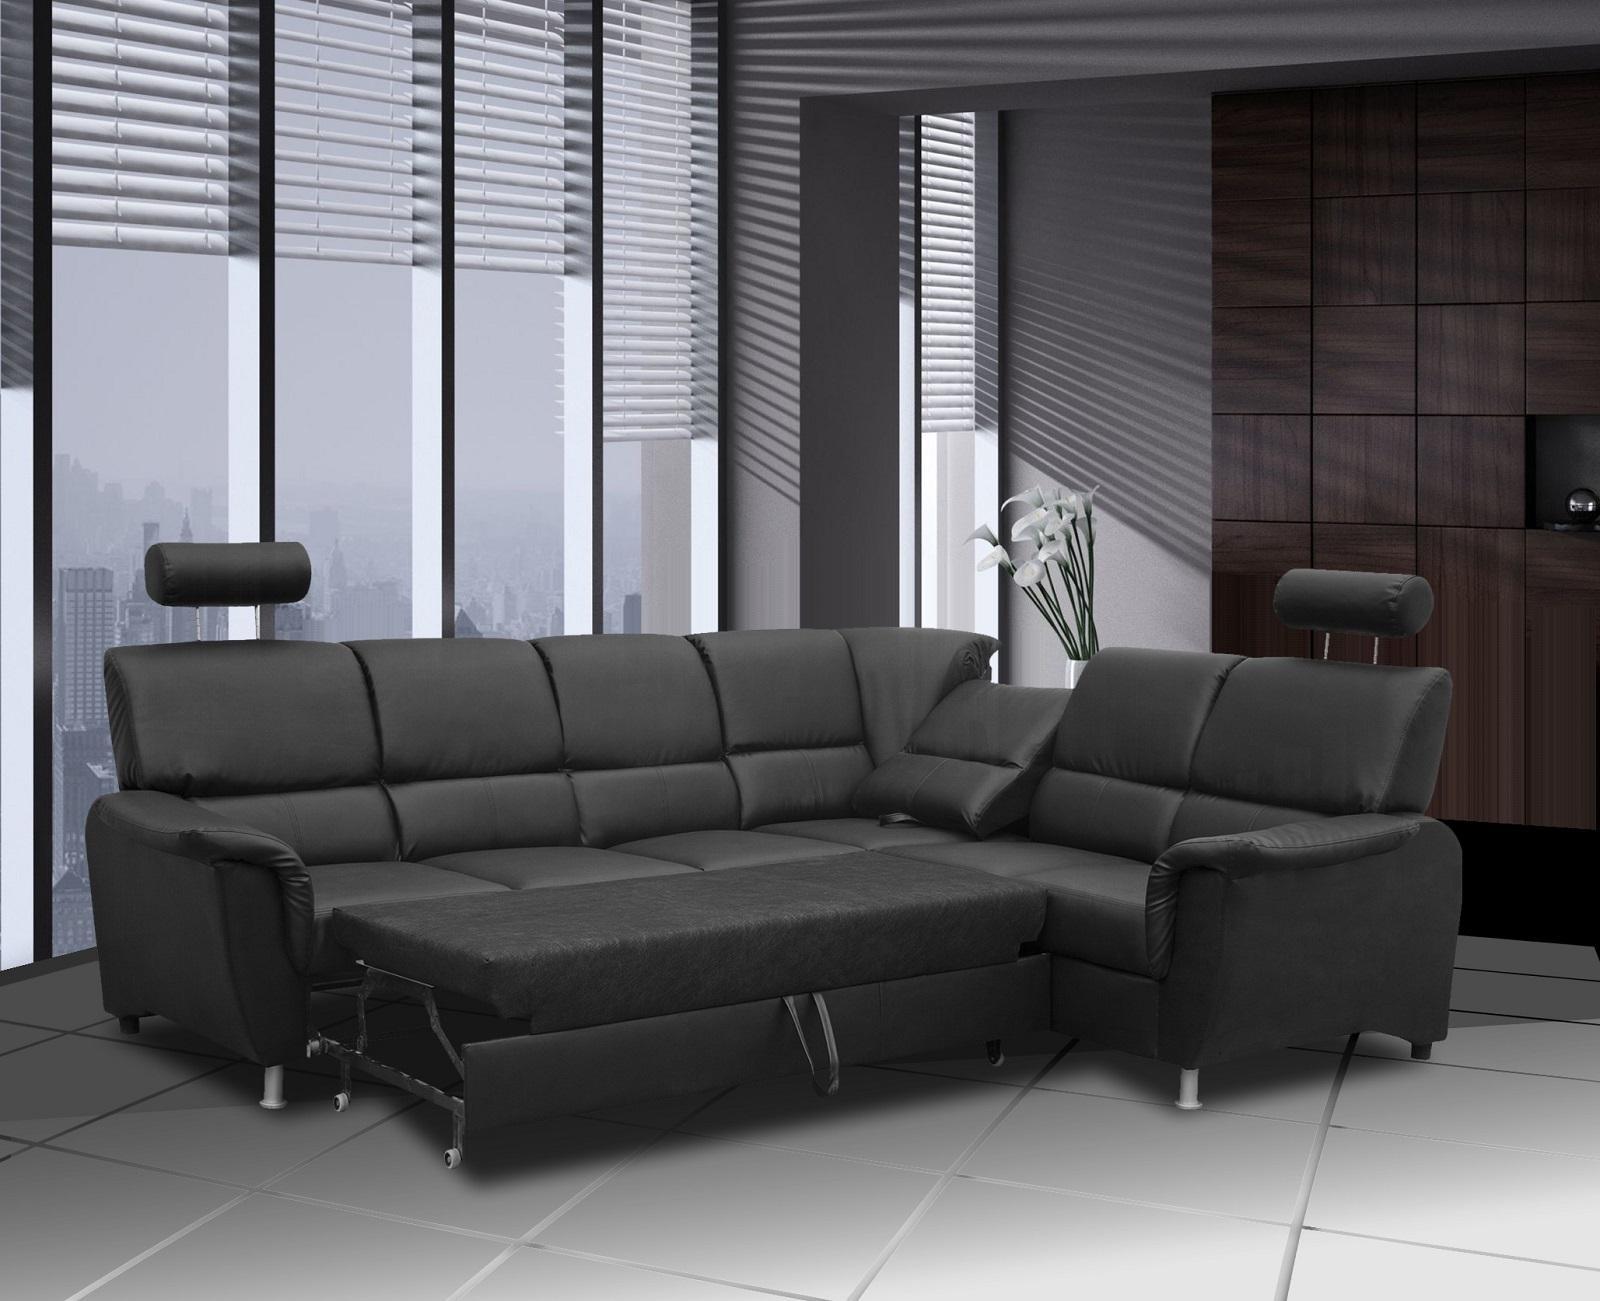 13 Sleeper Sofa San Diego | Carehouse Regarding Sleeper Sofas San Diego (Image 1 of 20)